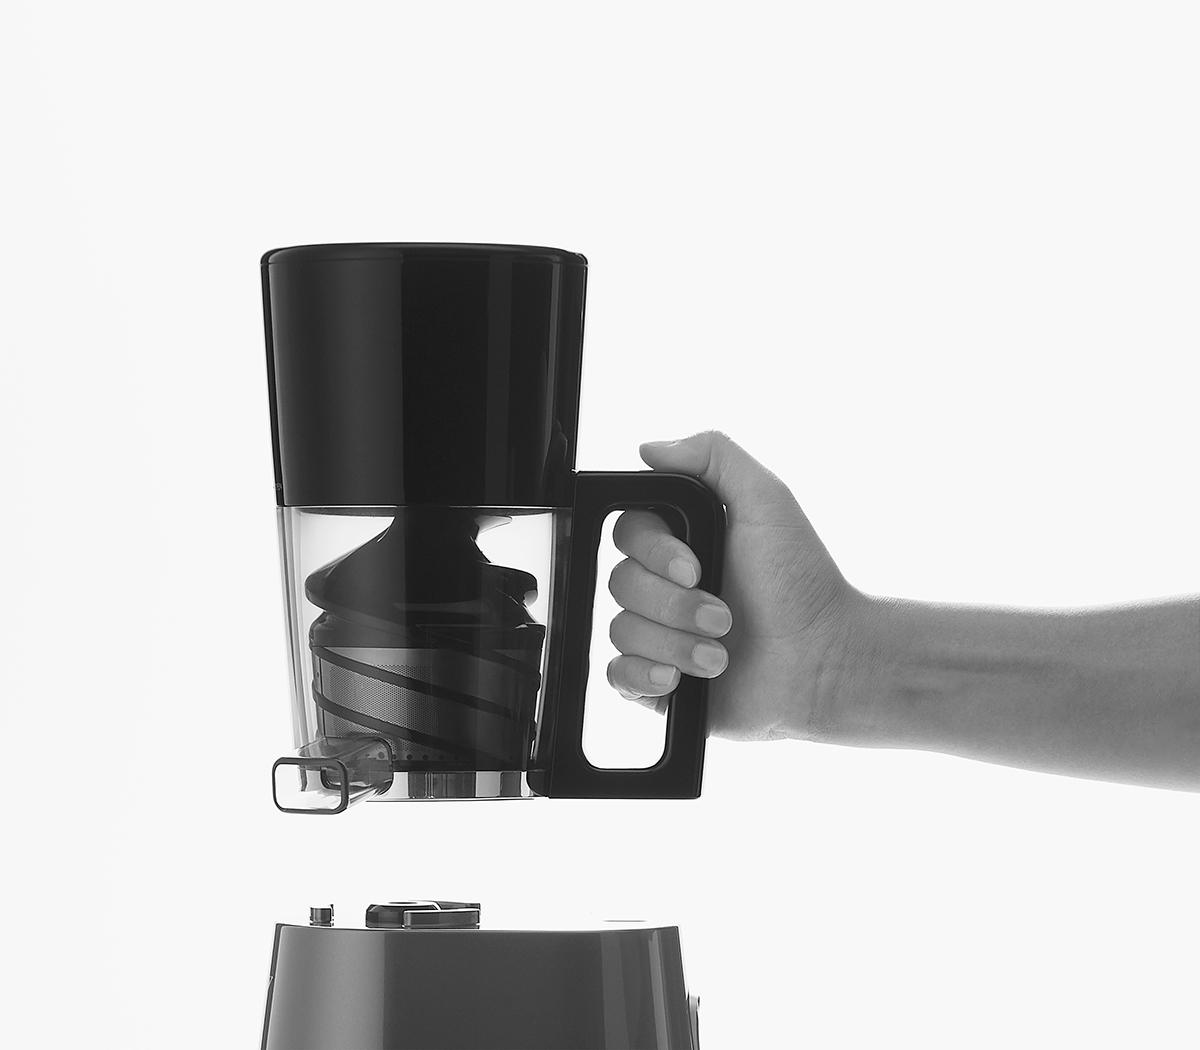 Juicepresso CJP-03